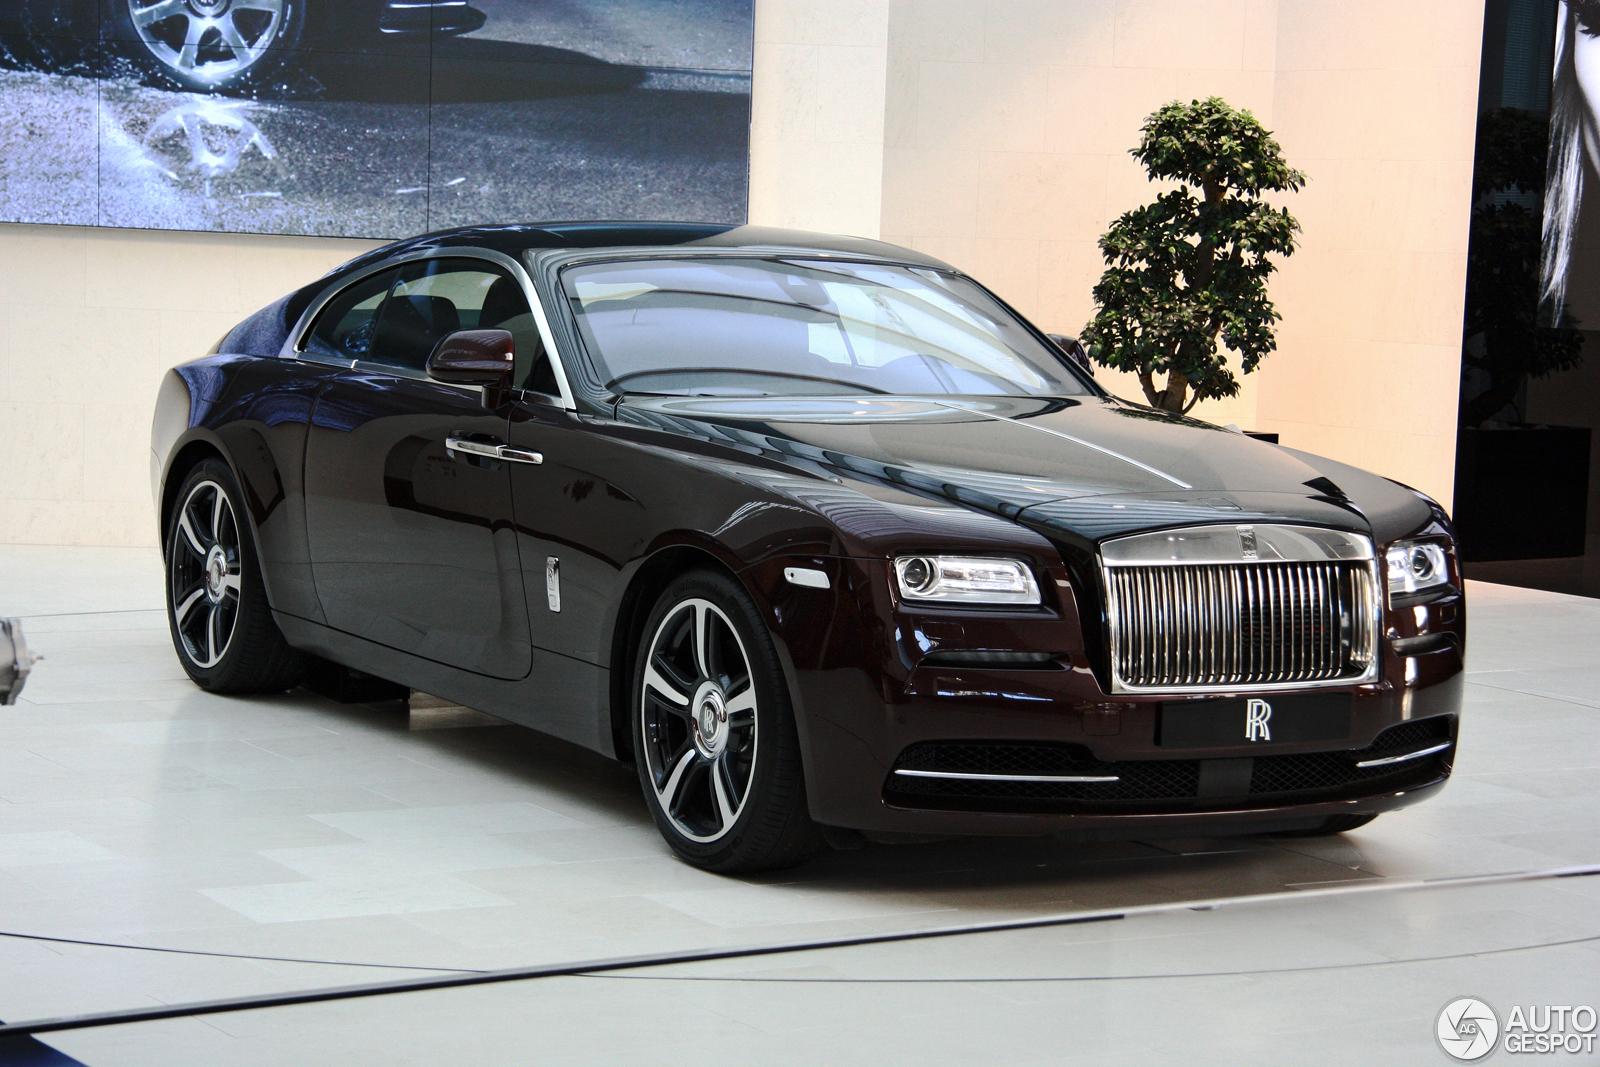 BMW shows beautiful Rolls-Royce Wraith at BMW-Welt